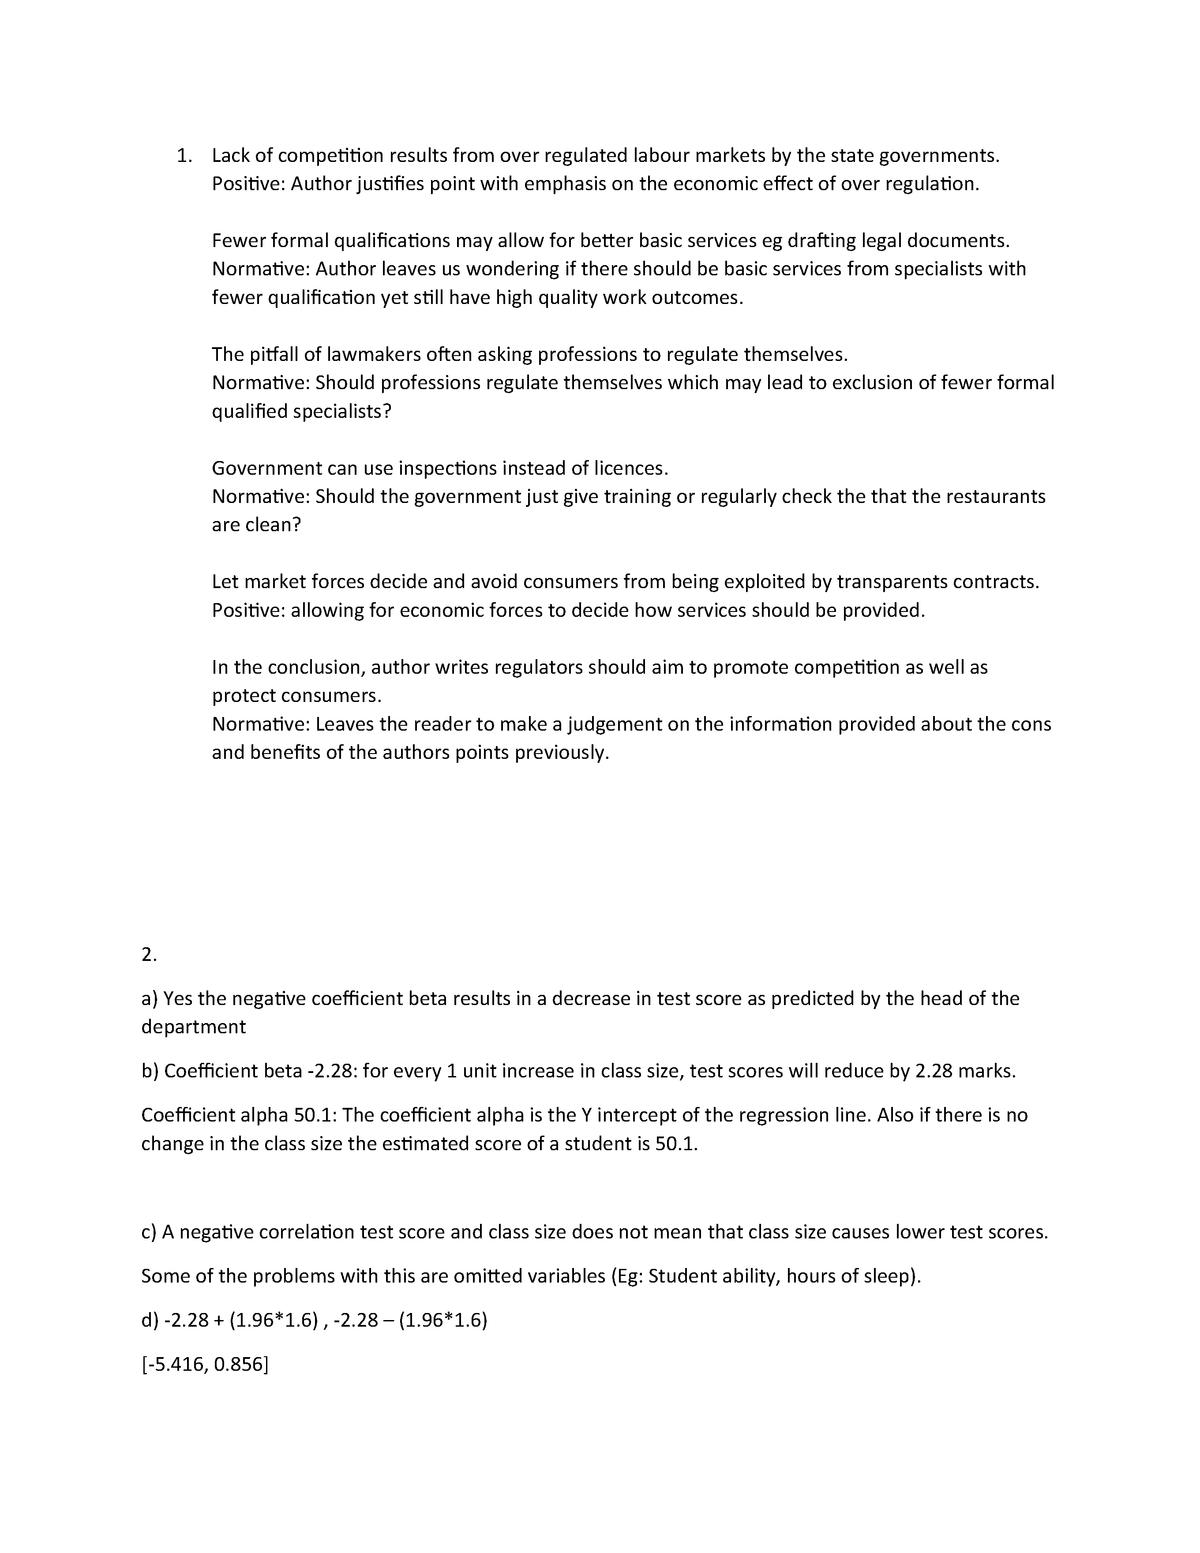 Problem set 1 - Chapter 1 questions - ECC3710 - Monash - StuDocu